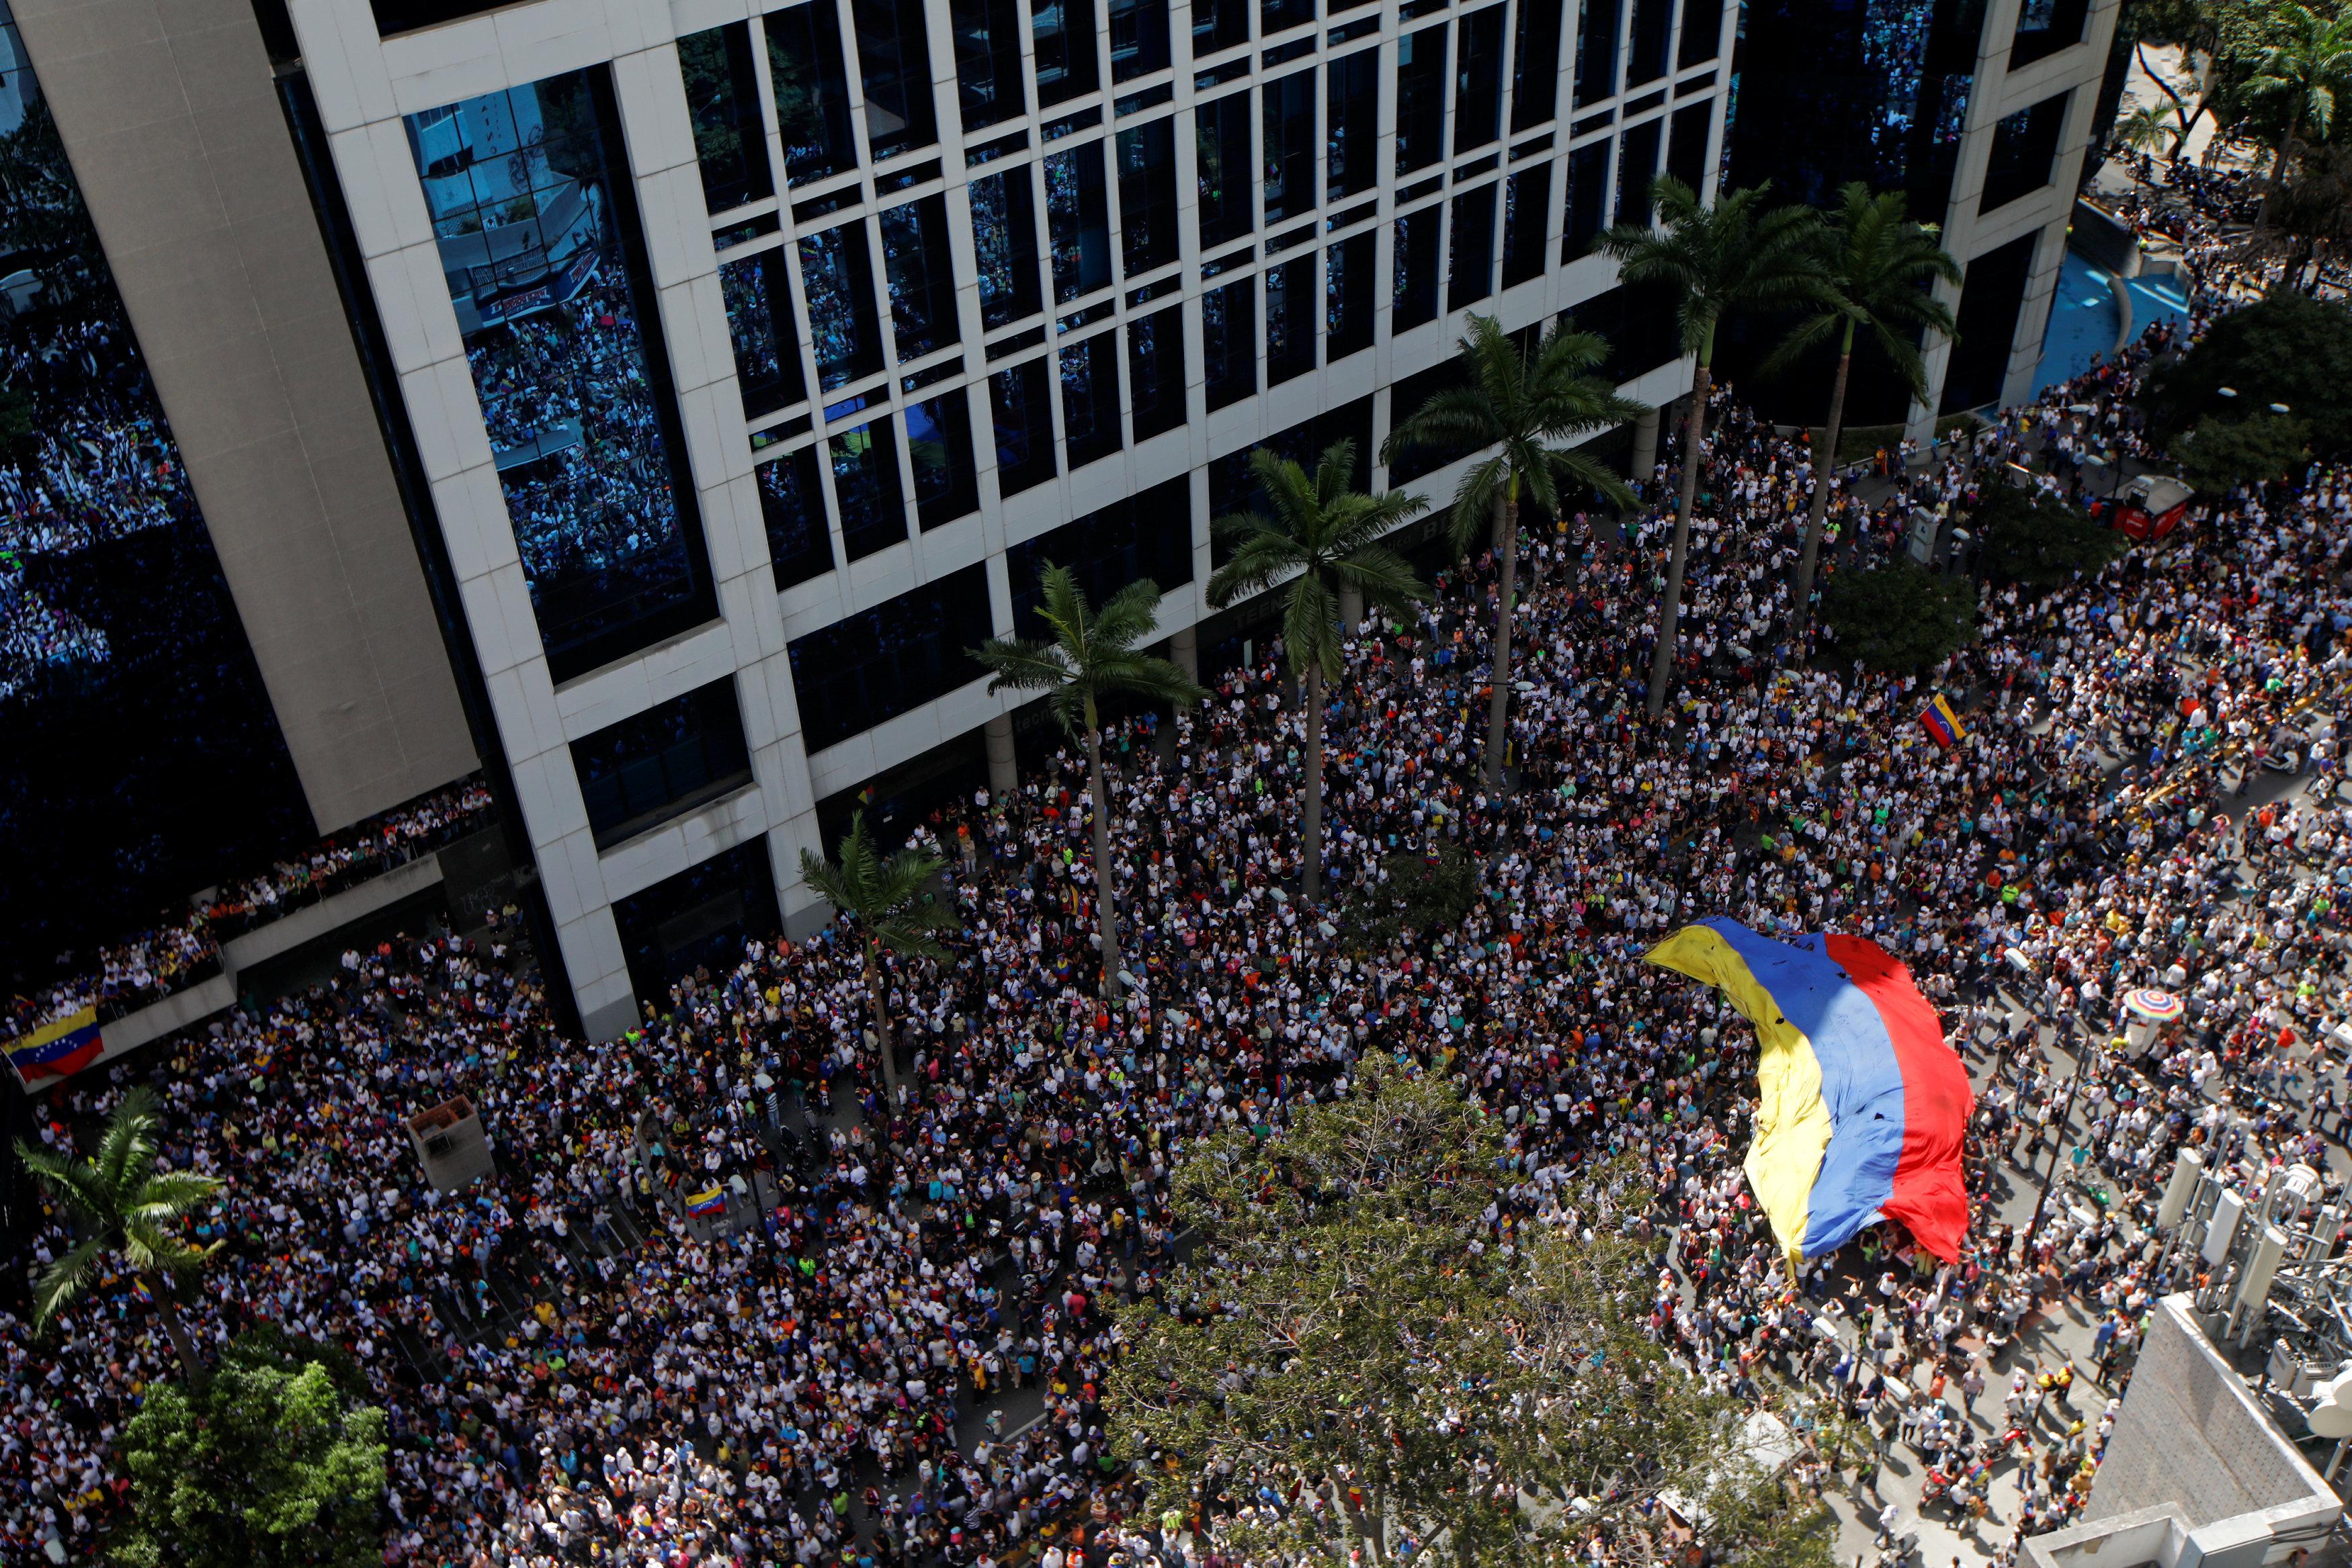 venezoyela-aytoanakirychthike-proedros-o-choyan-gkoyainto-amp-8211-anagnorisi-kai-apo-ton-tramp2